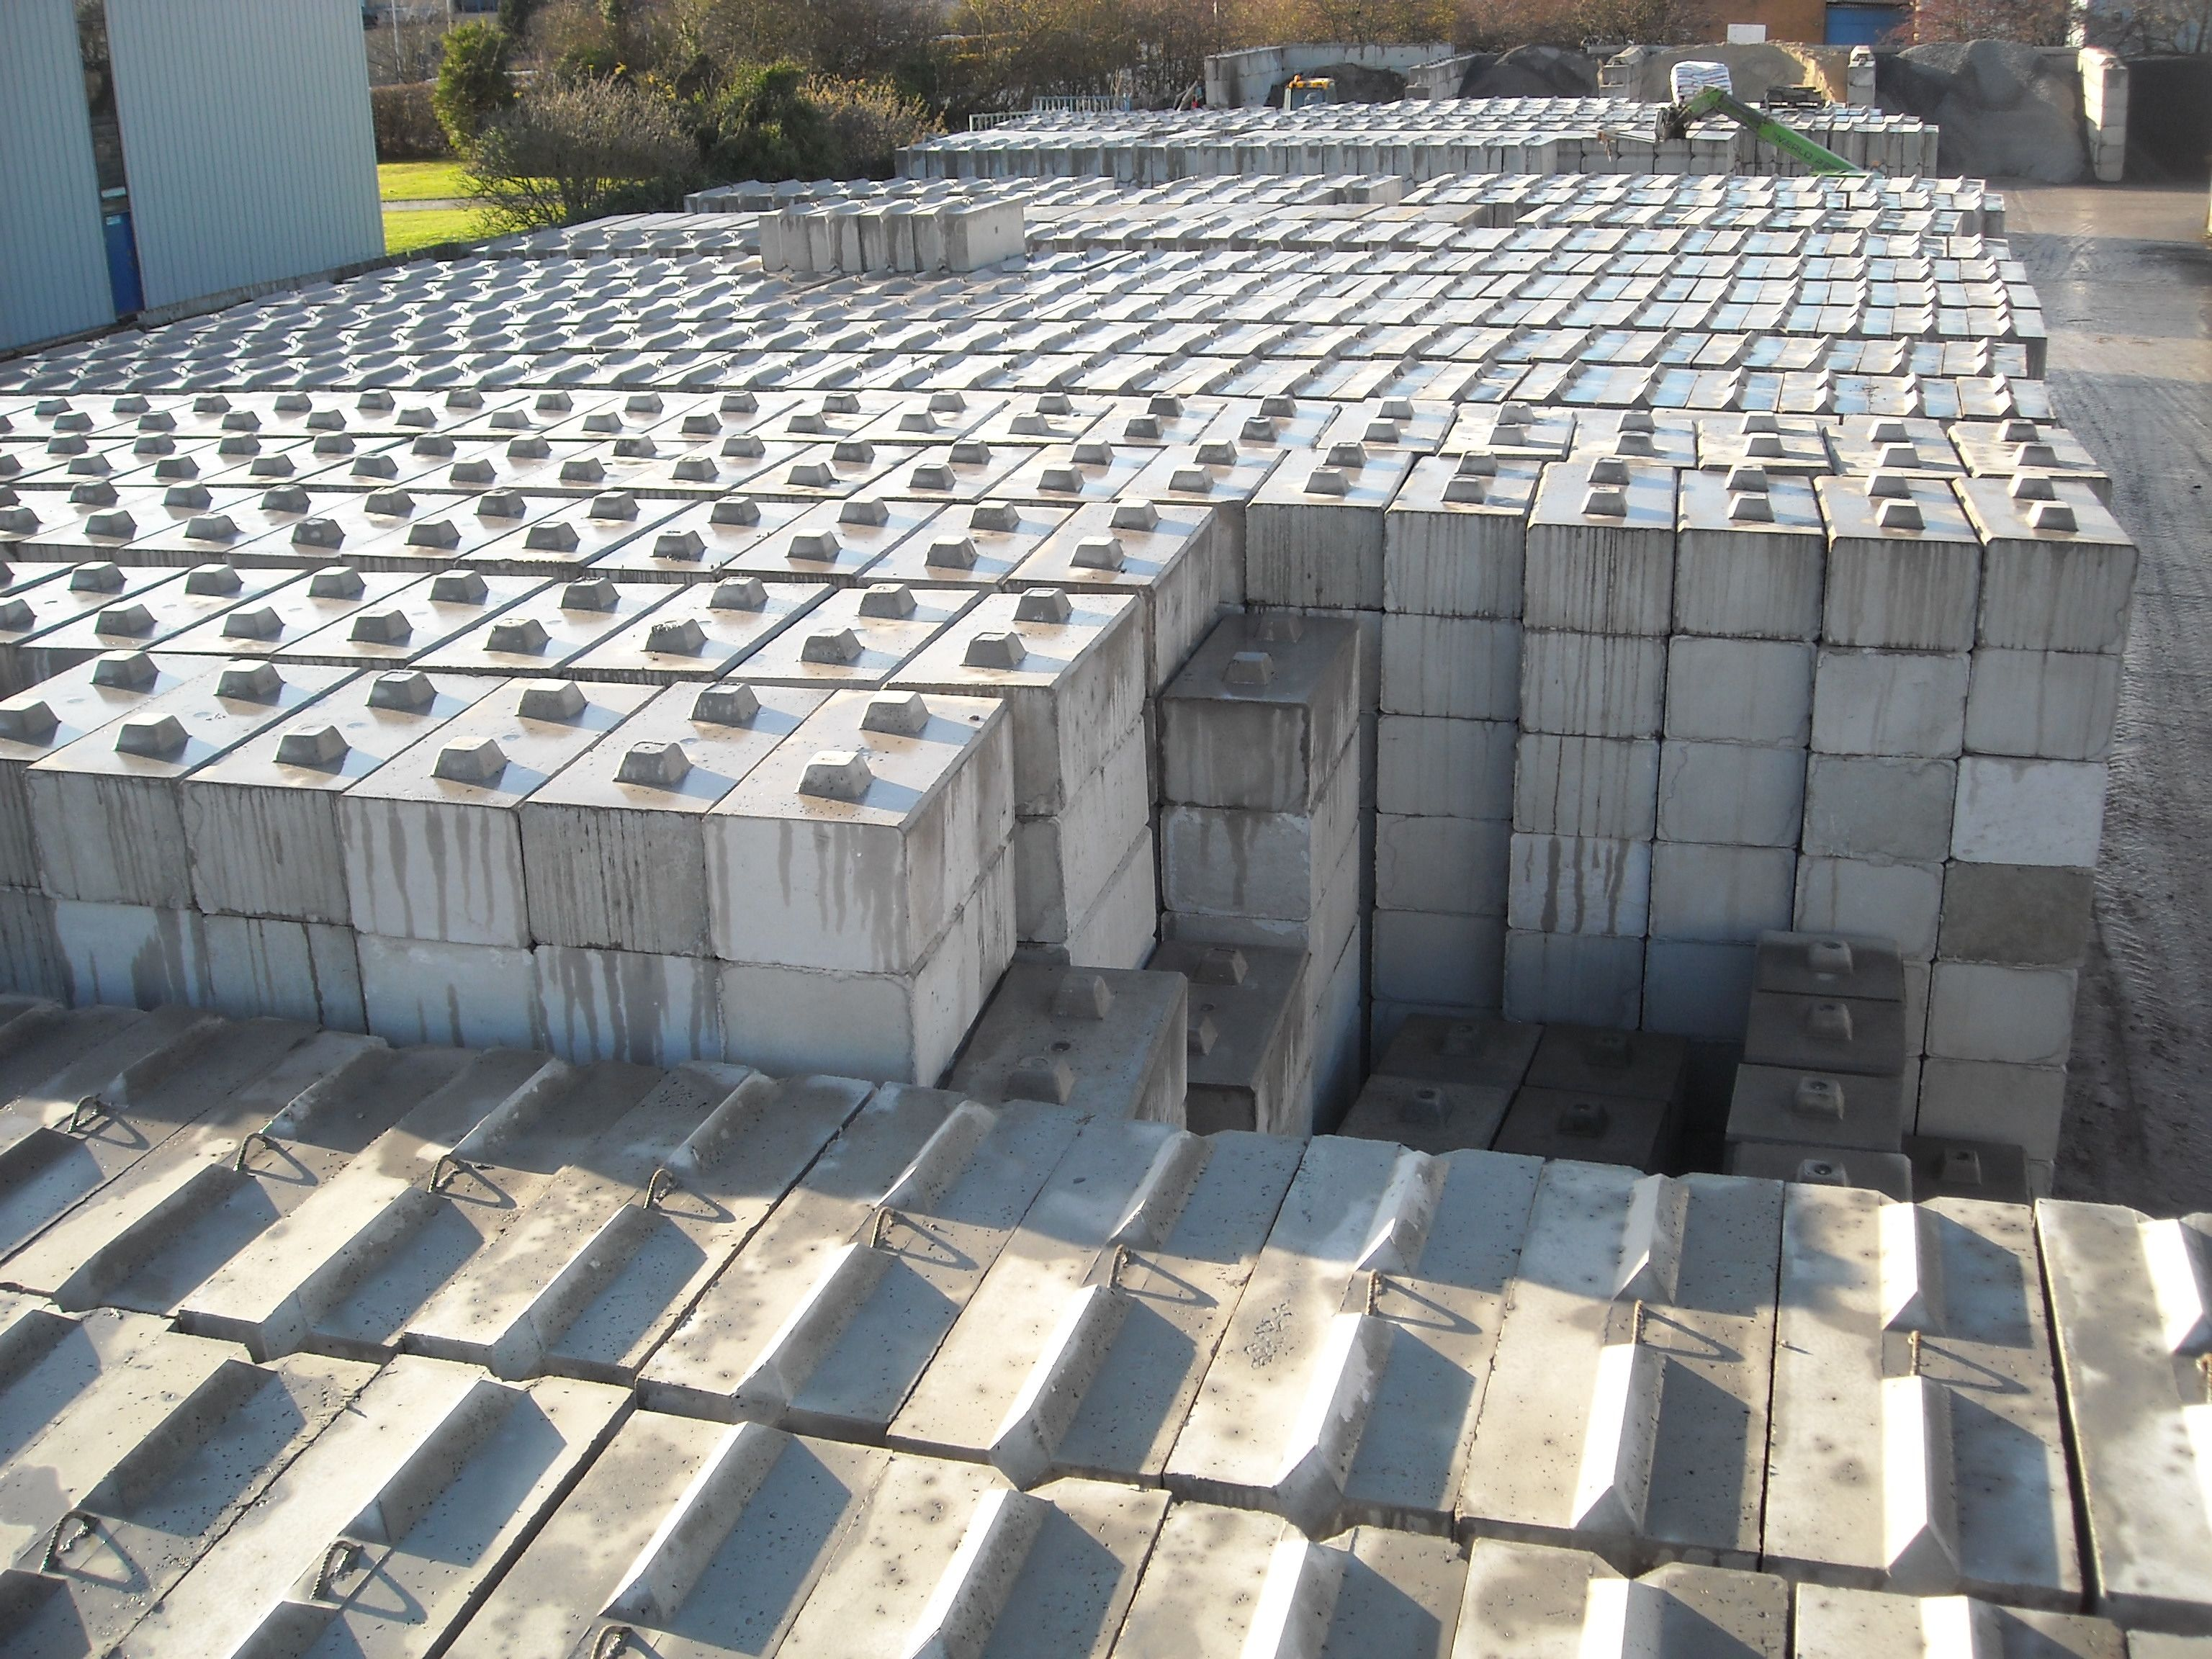 Interlocking Duo Concrete Blocks Lego Stye In Stockyard Concrete Blocks Architecture Plan Precast Concrete